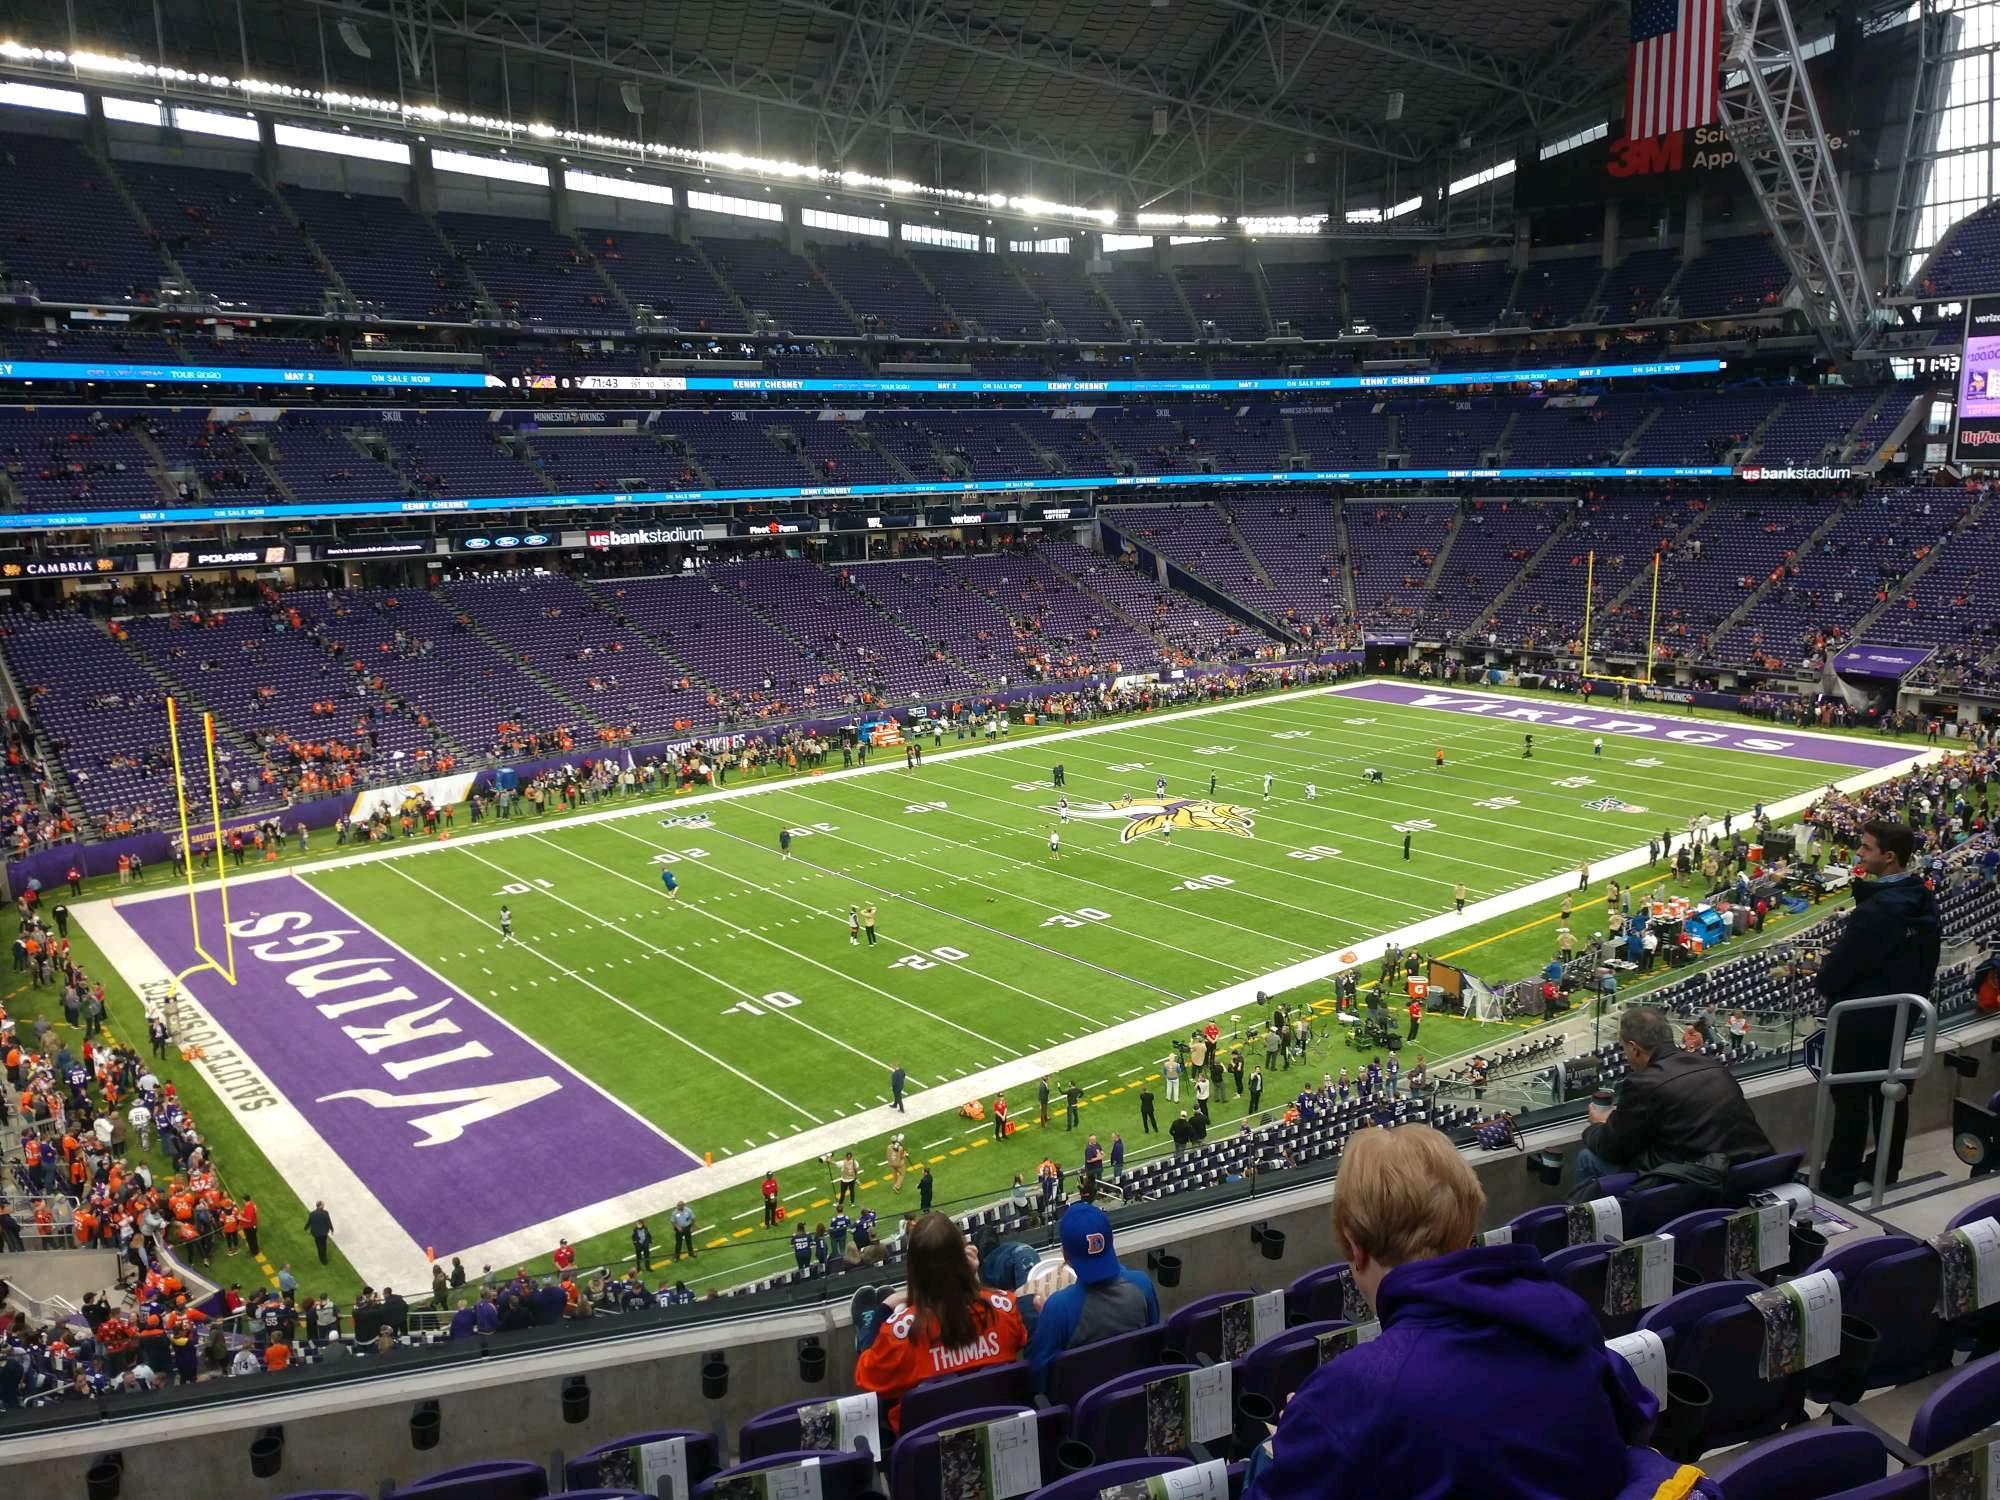 U.S. Bank Stadium Section 240 Row 6 Seat 10